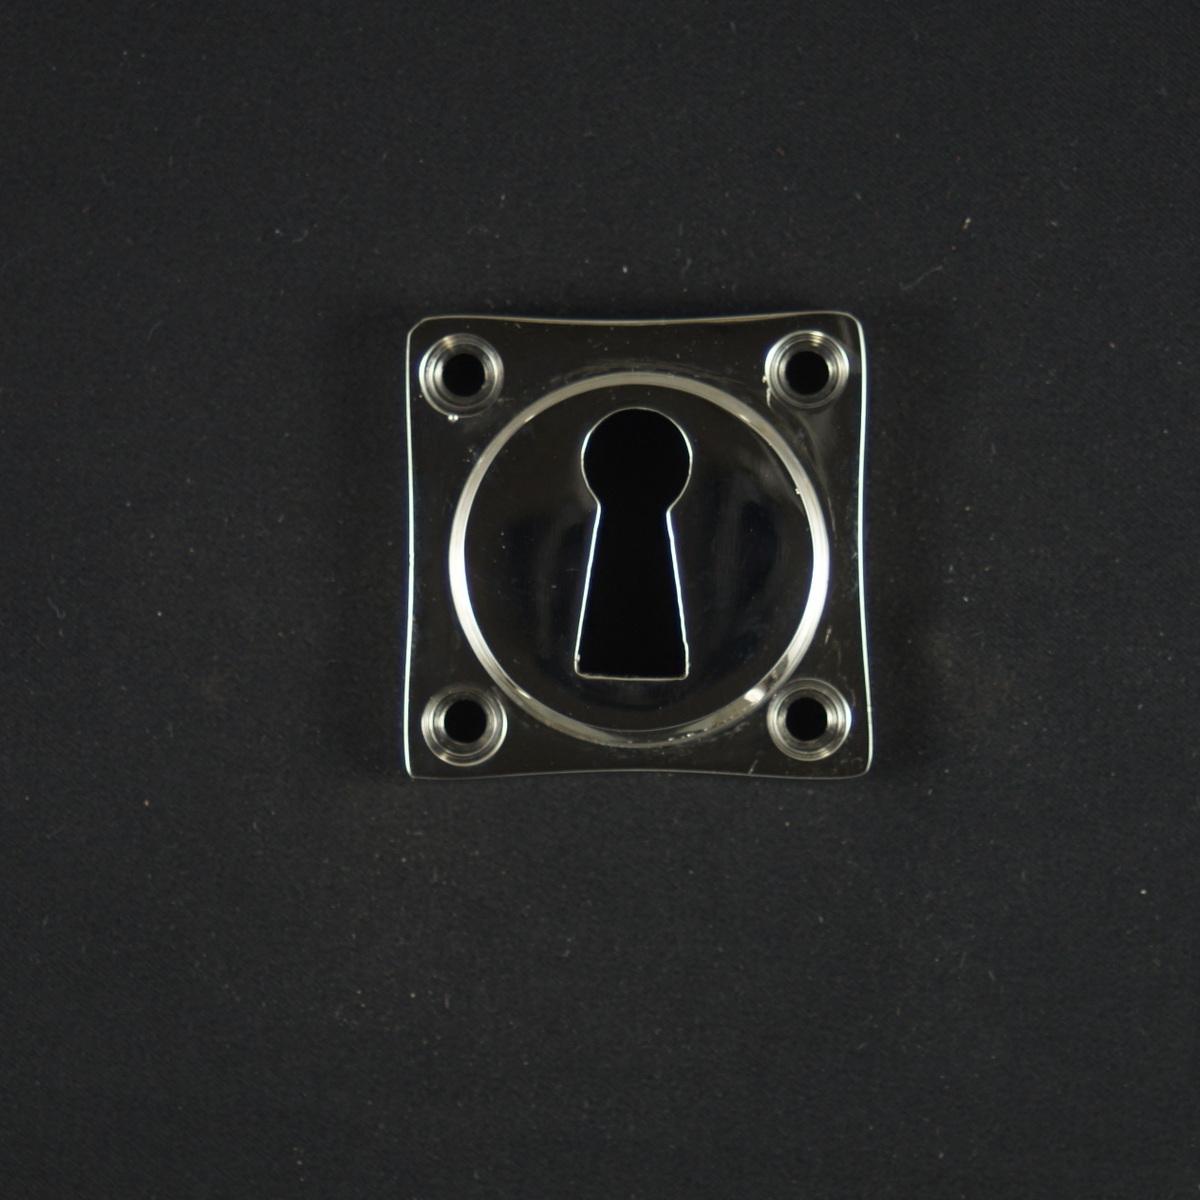 Schlüsselrosette - antike Tür Rosette, Zierrosette, Türbeschlag